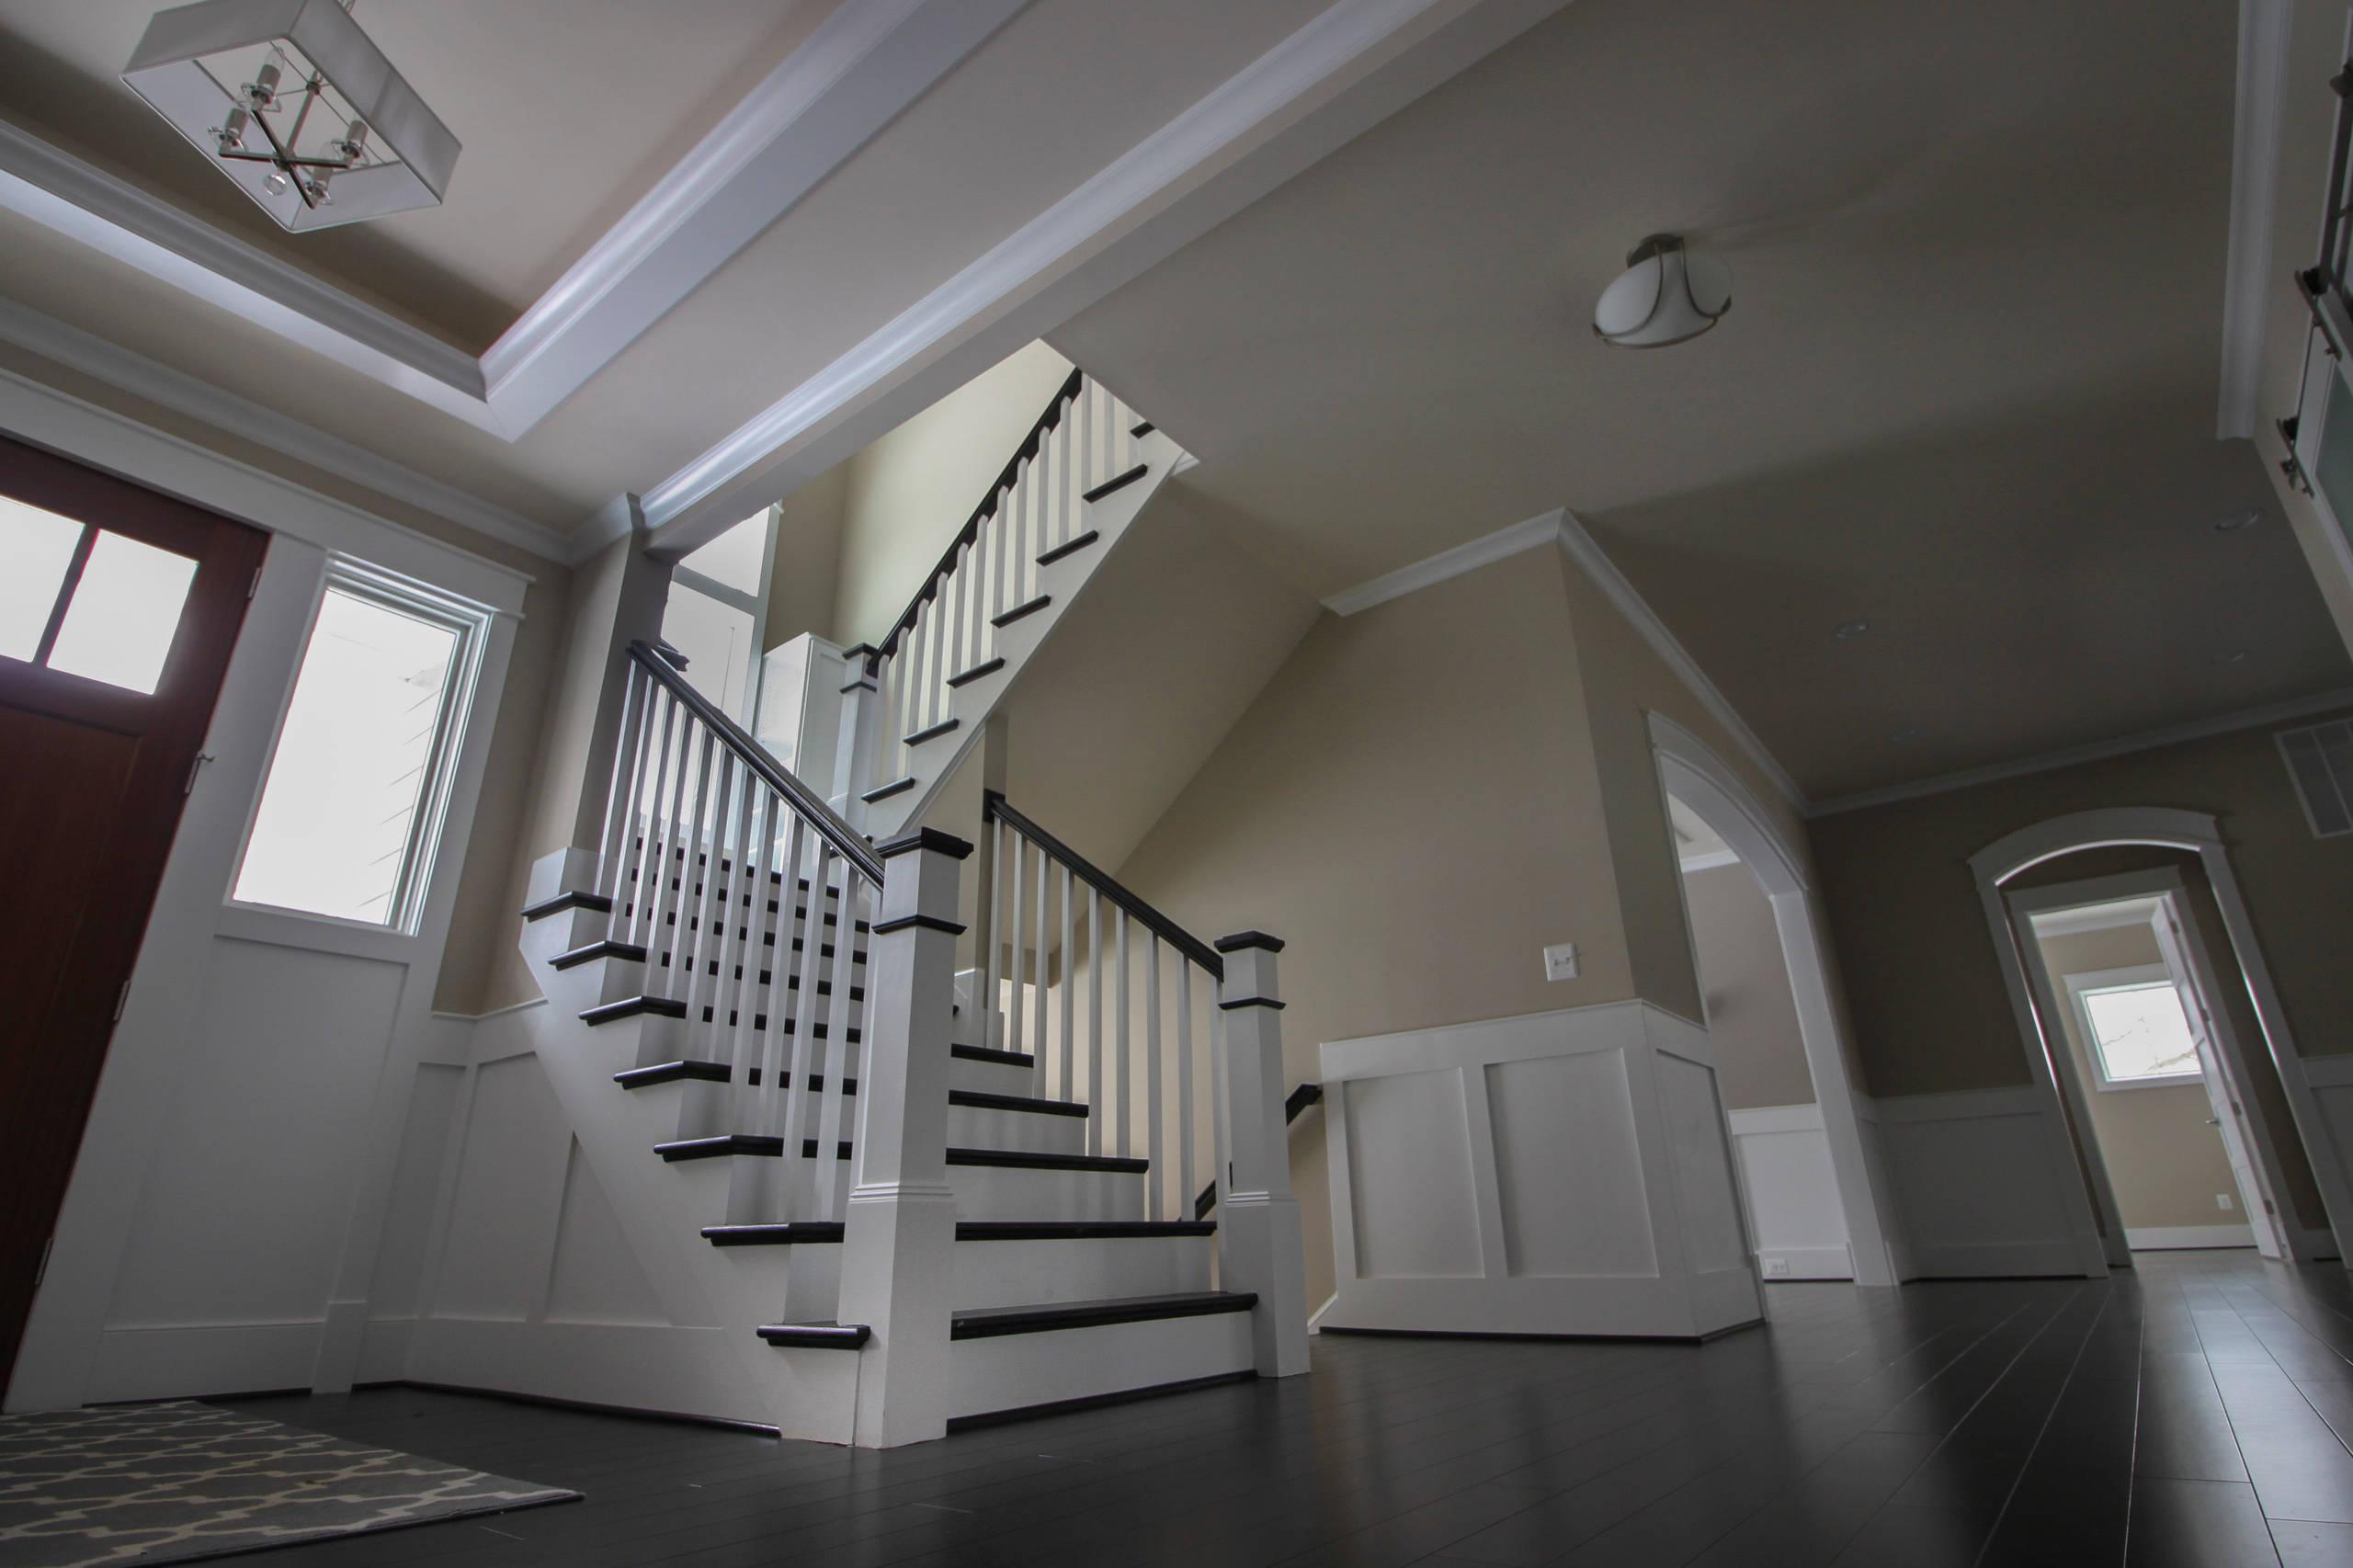 47_Refined Simplicity in Modern Residence, Vienna VA 22180